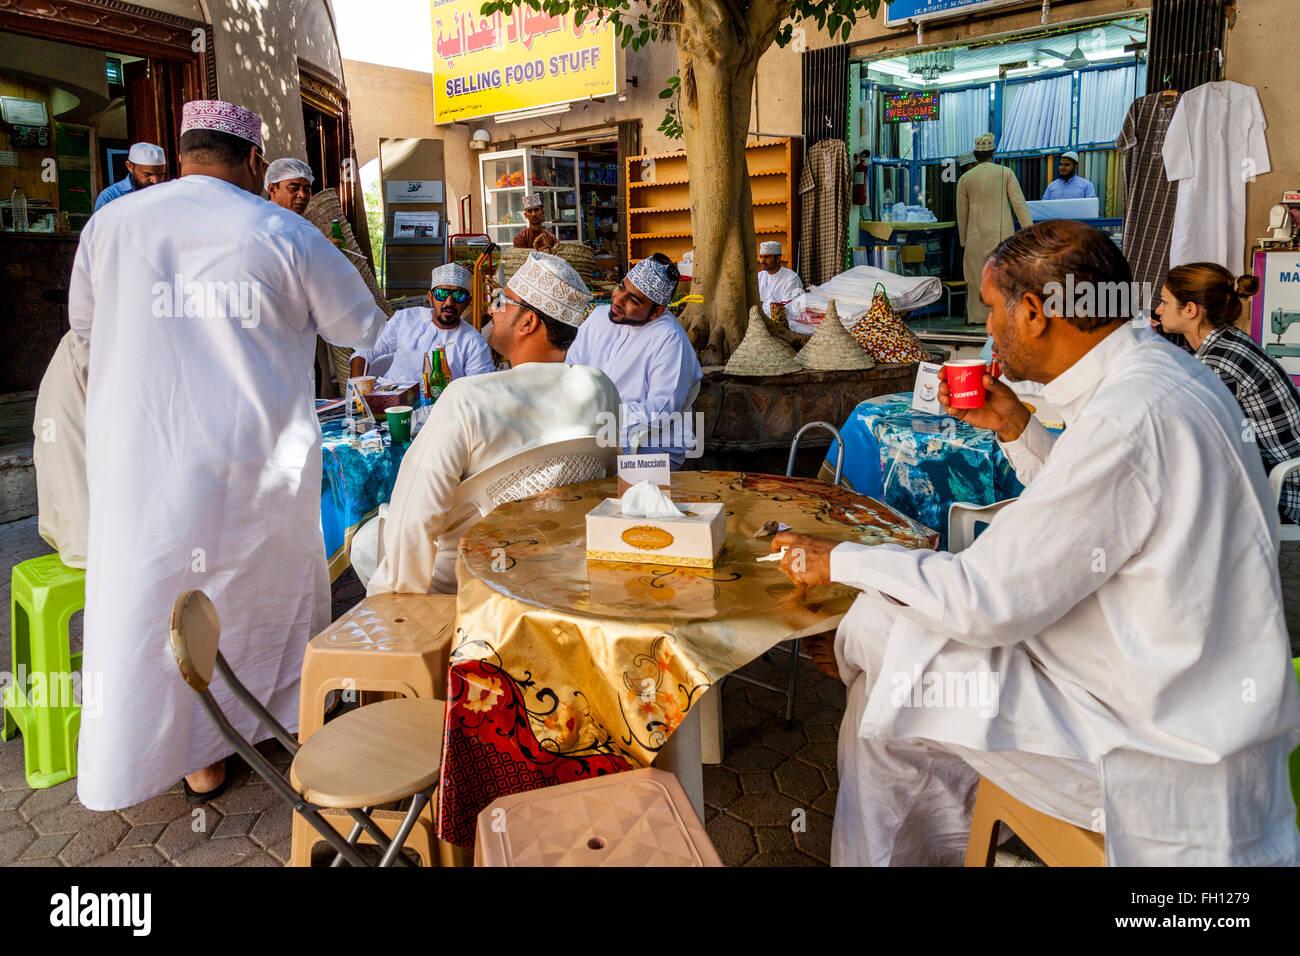 Omanis Men Stock Photos & Omanis Men Stock Images - Alamy